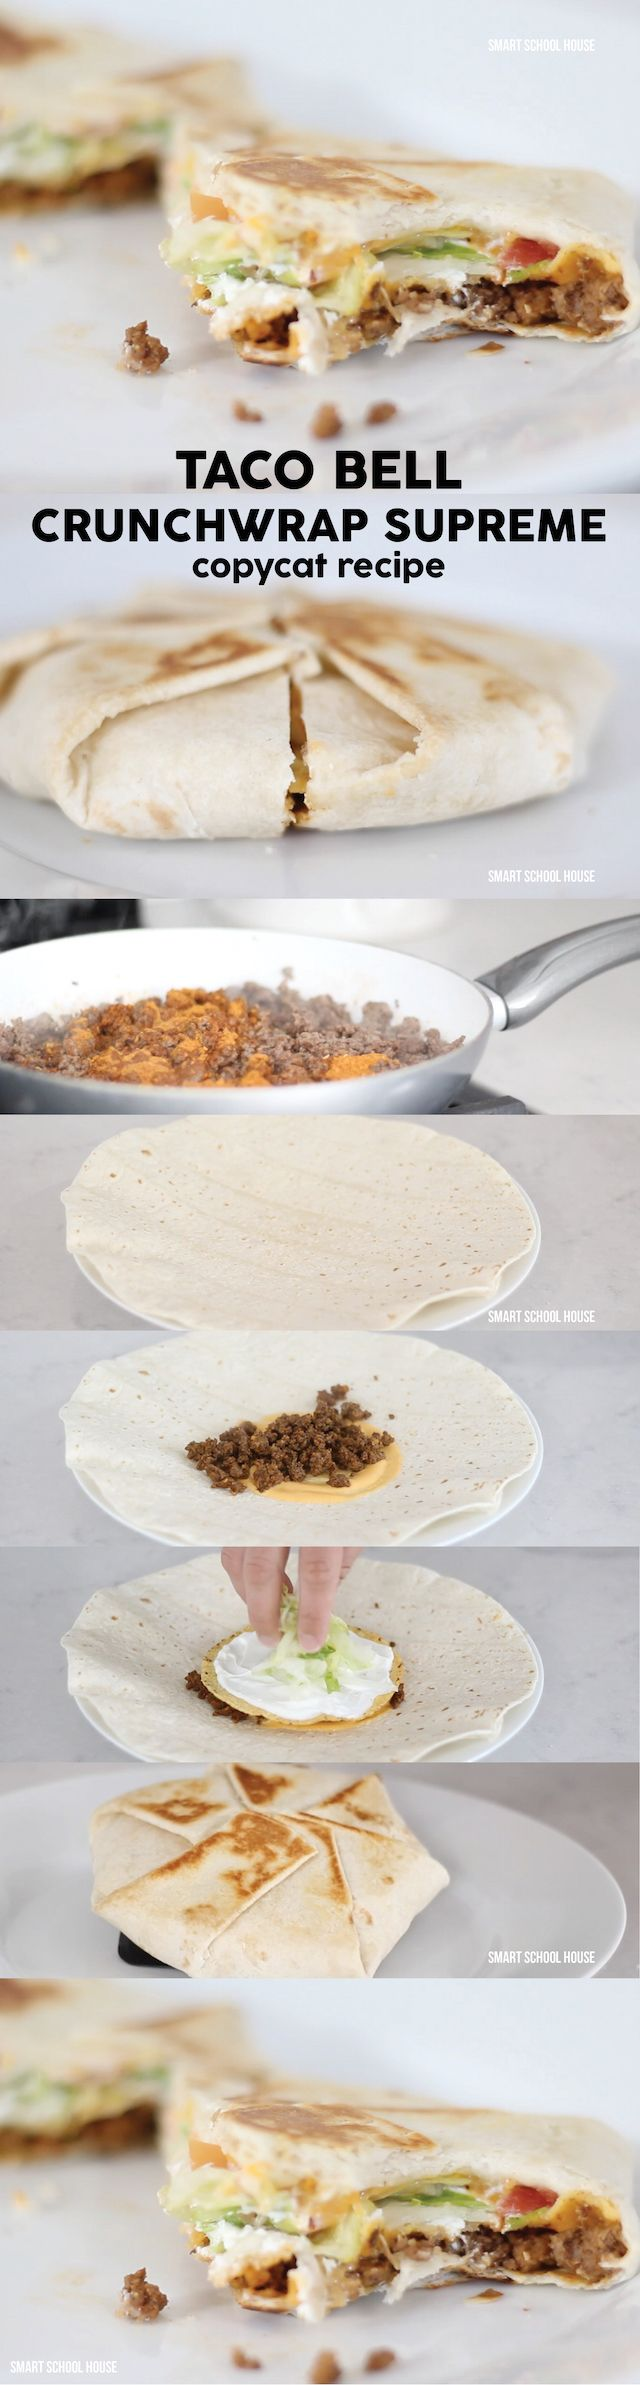 DIY Taco Bell Crunchwrap Supreme copycat recipe to make a home. Saving this!